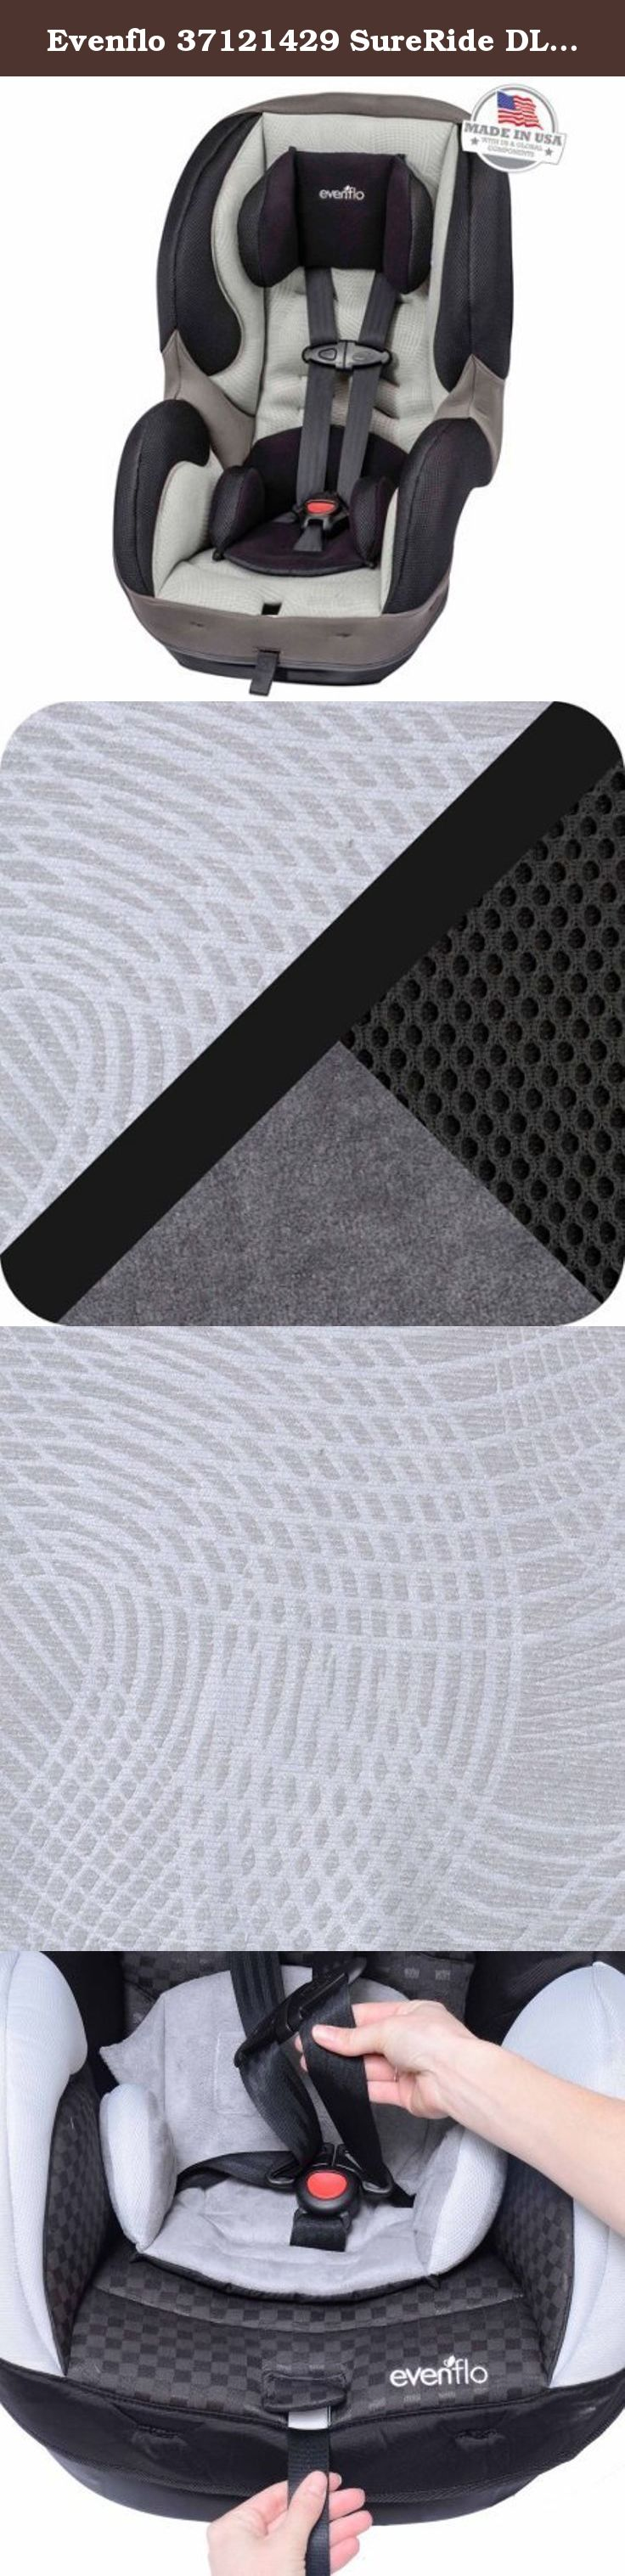 Evenflo SureRide DLX Convertible Car Seat Paxton 37121429